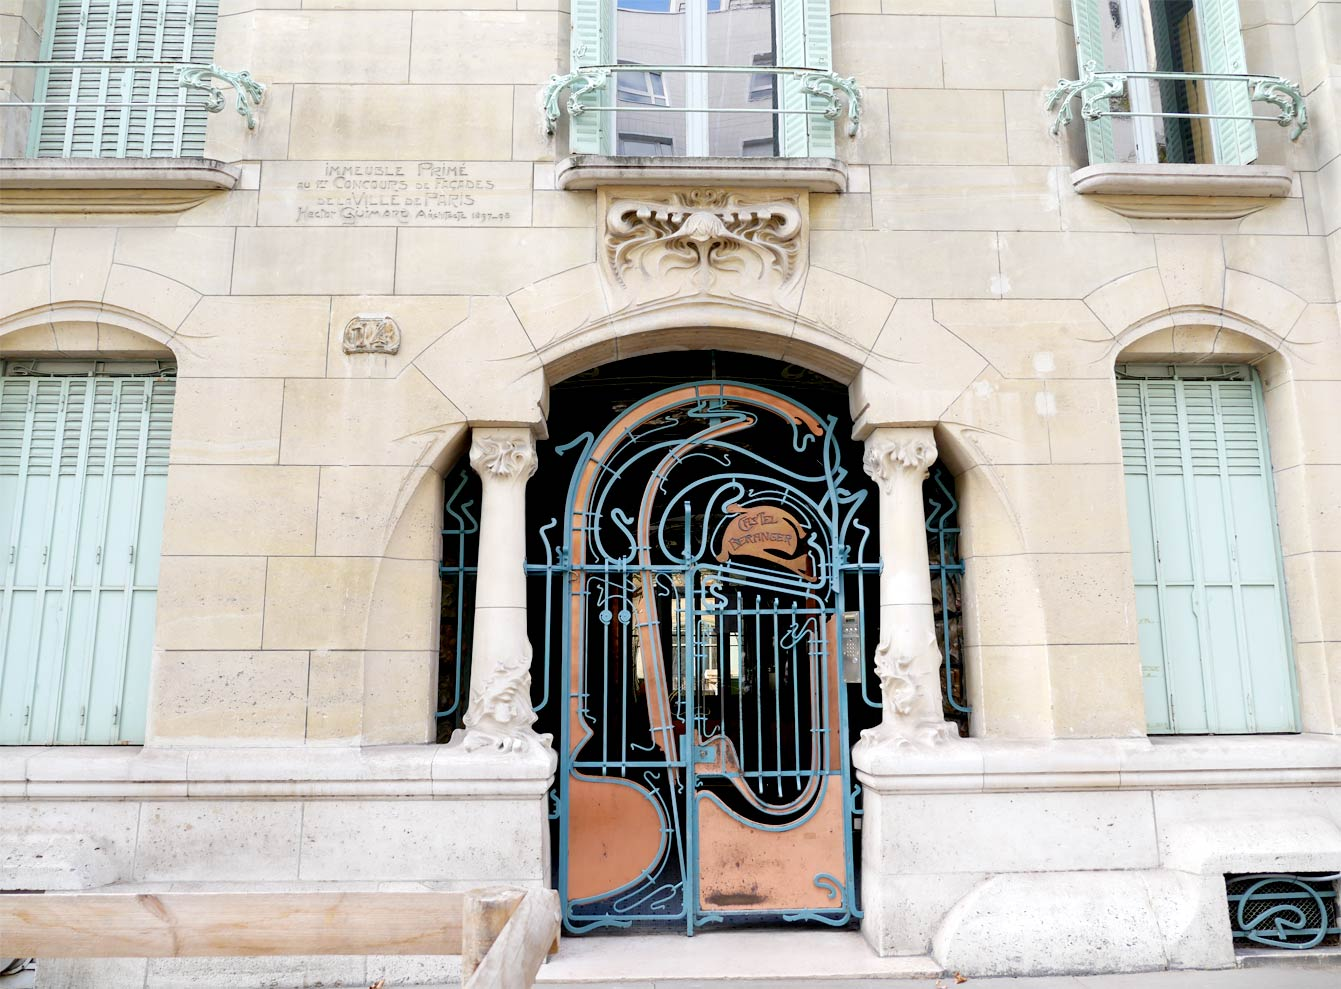 Porte du Castel Béranger, Paris 16e